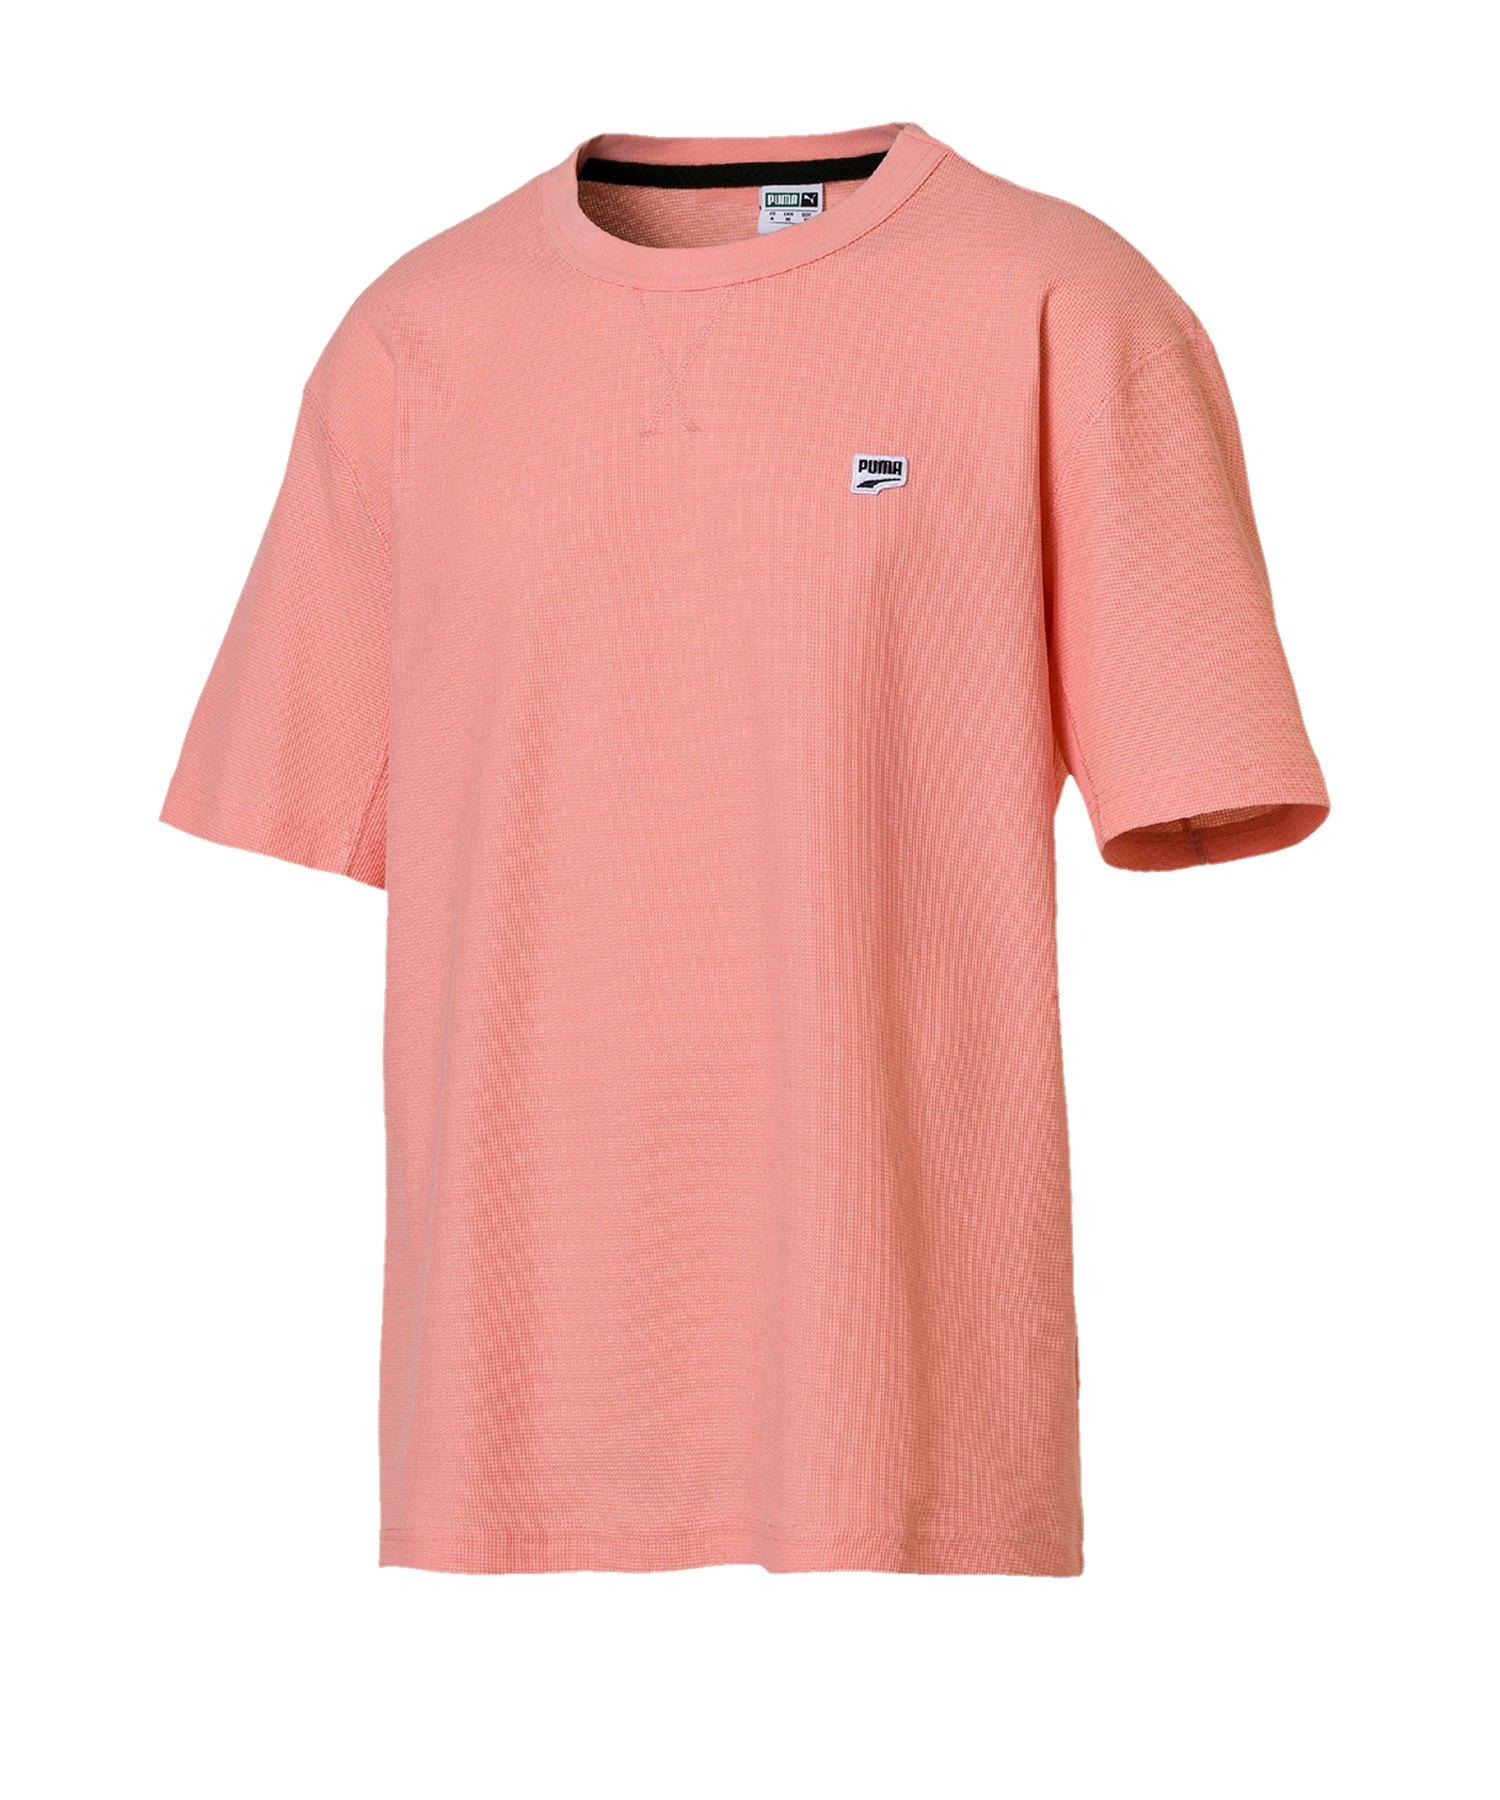 PUMA Downtown Tee T-Shirt Rosa F19 - rosa